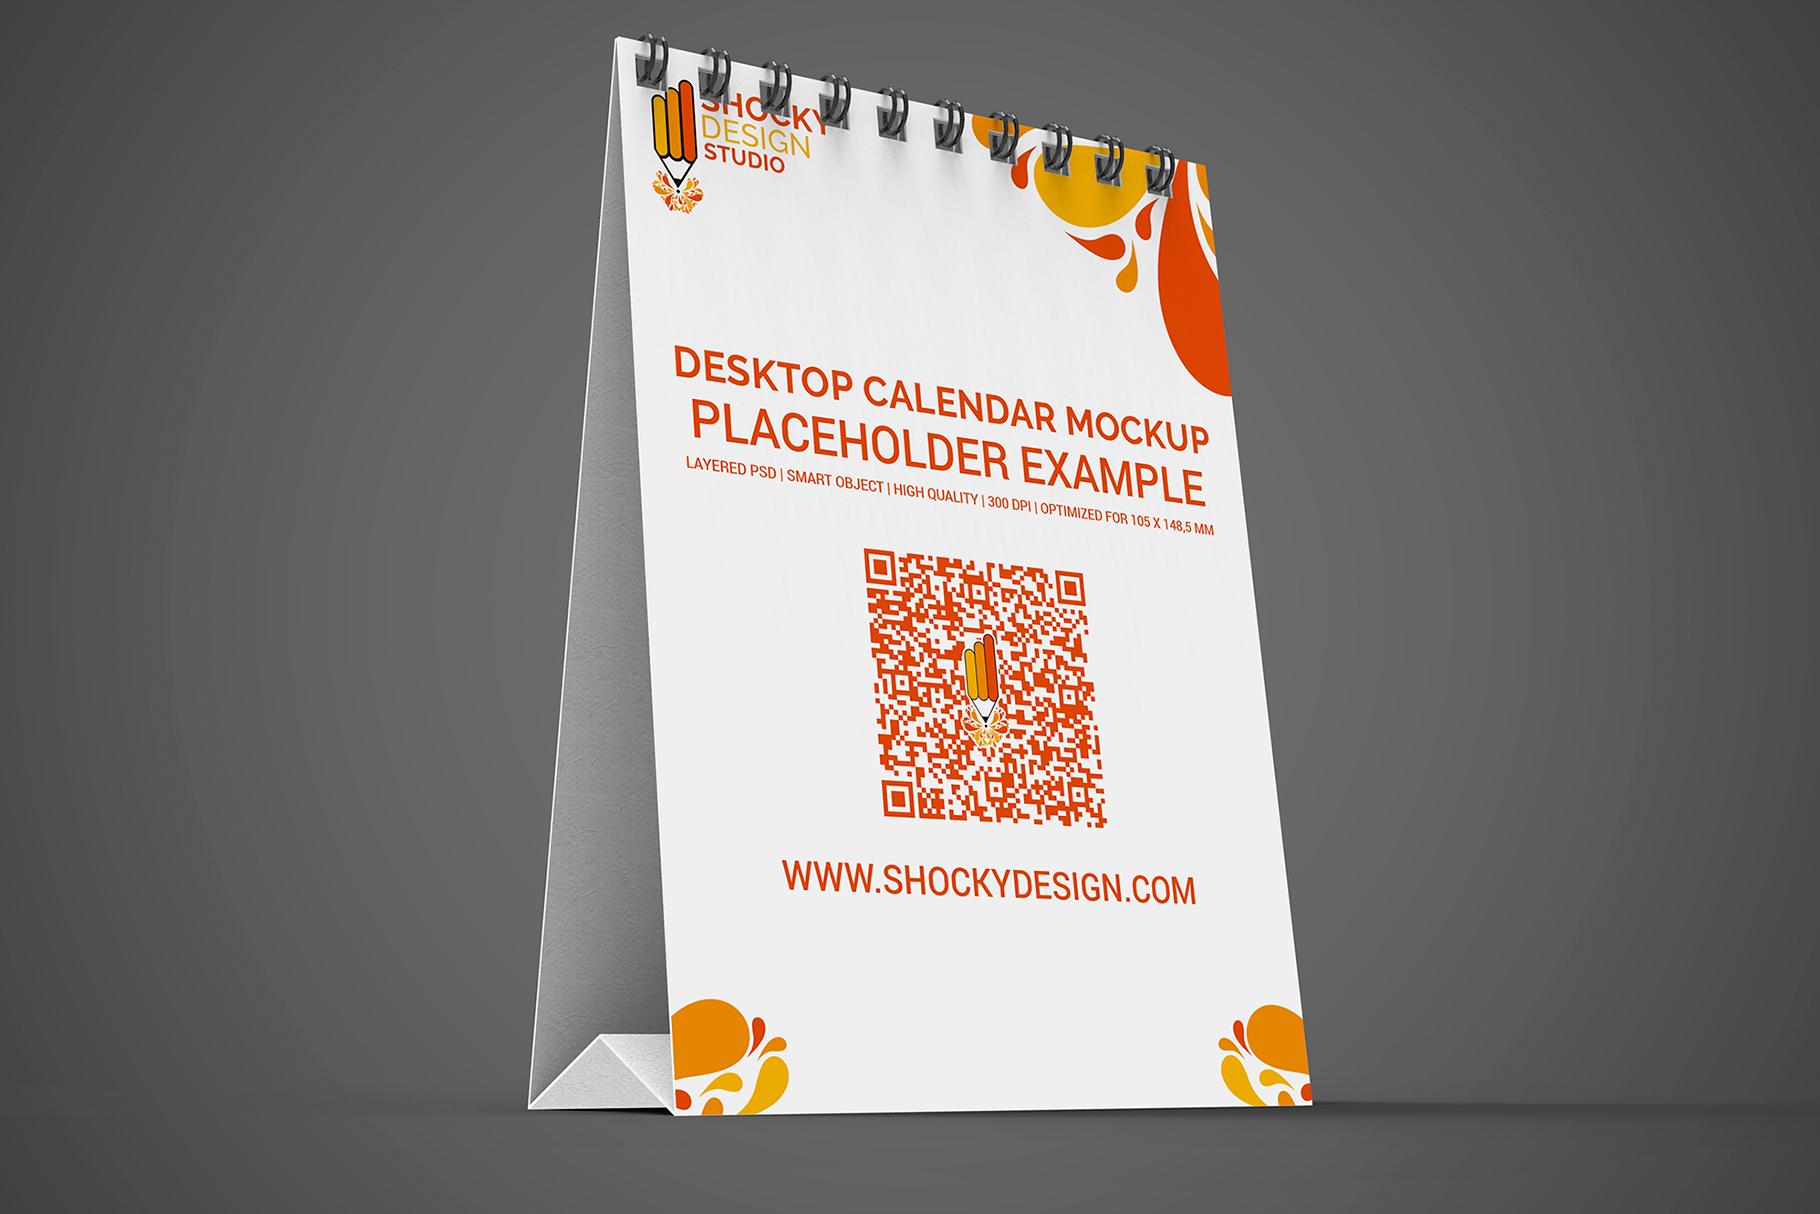 Desktop Calendar A6 Mockup example image 2